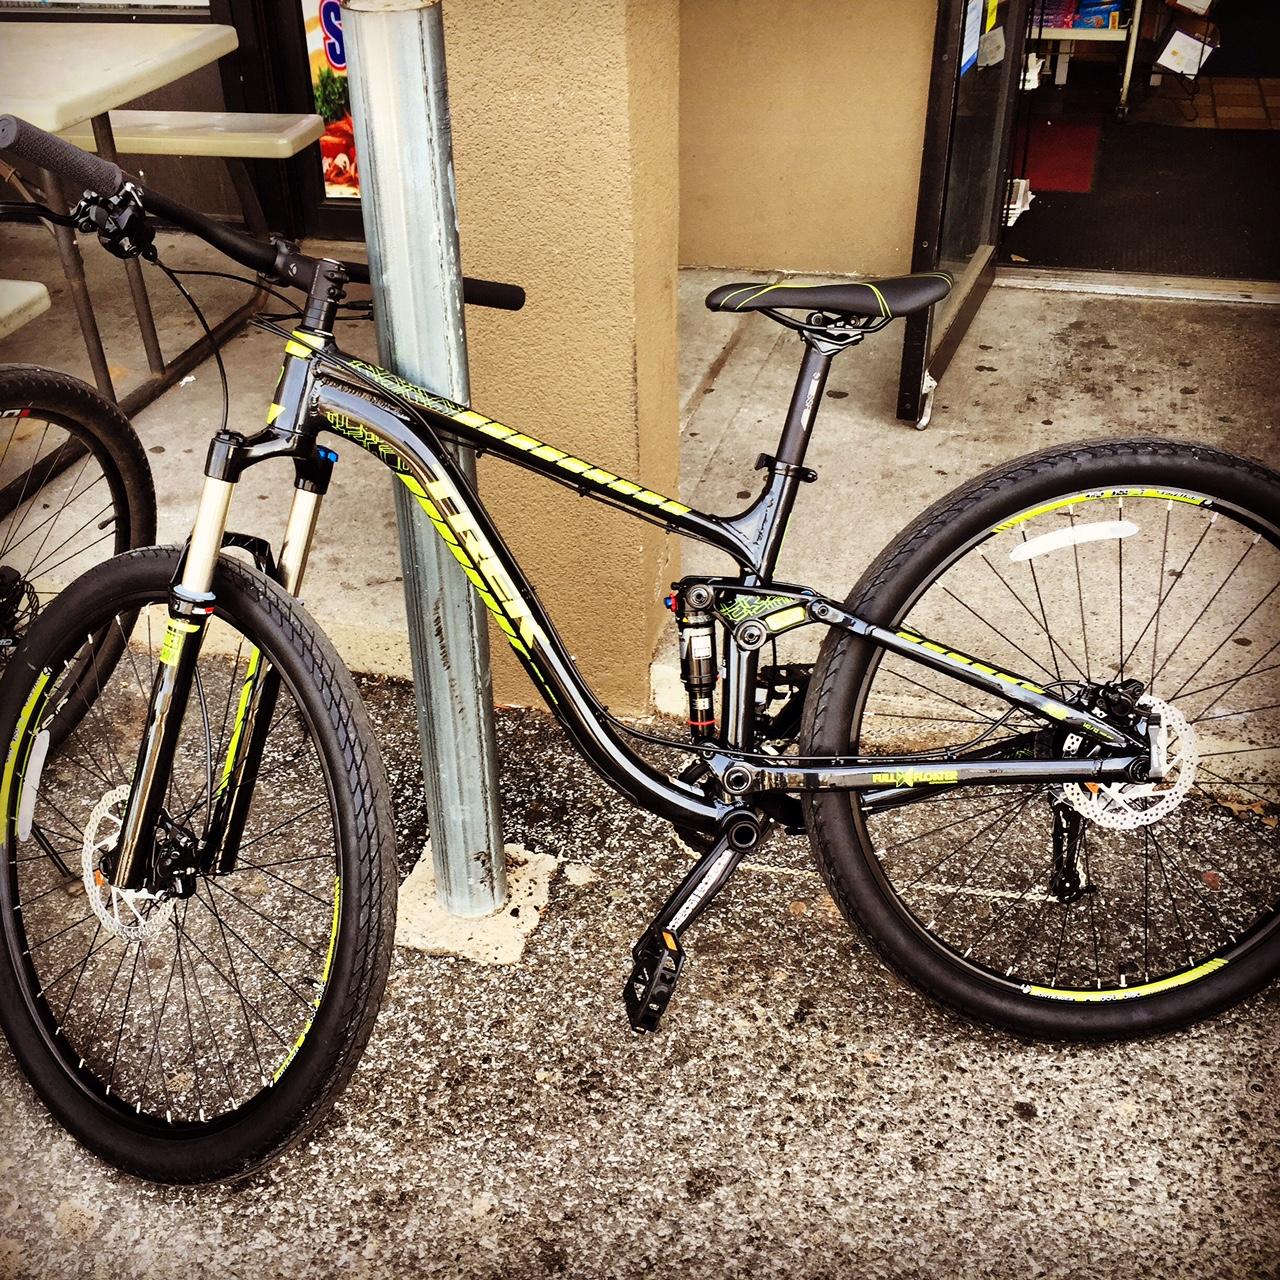 75e6f2b341d For Sale - trek fuel ex 5 29er | Ridemonkey Forums